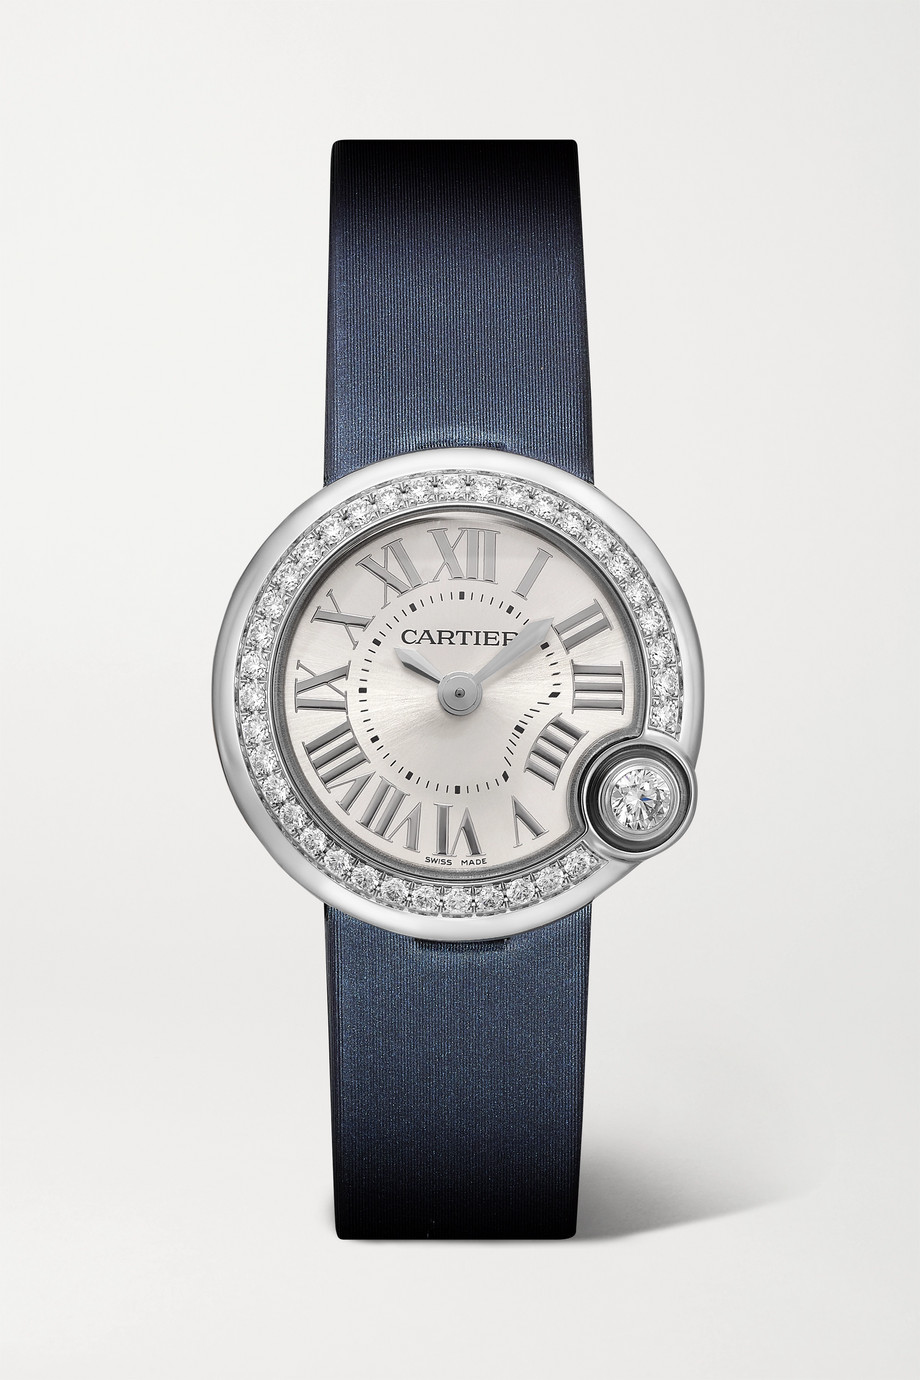 Cartier Ballon Blanc de Cartier 26 mm Uhr aus Edelstahl mit Lederarmband und Diamanten